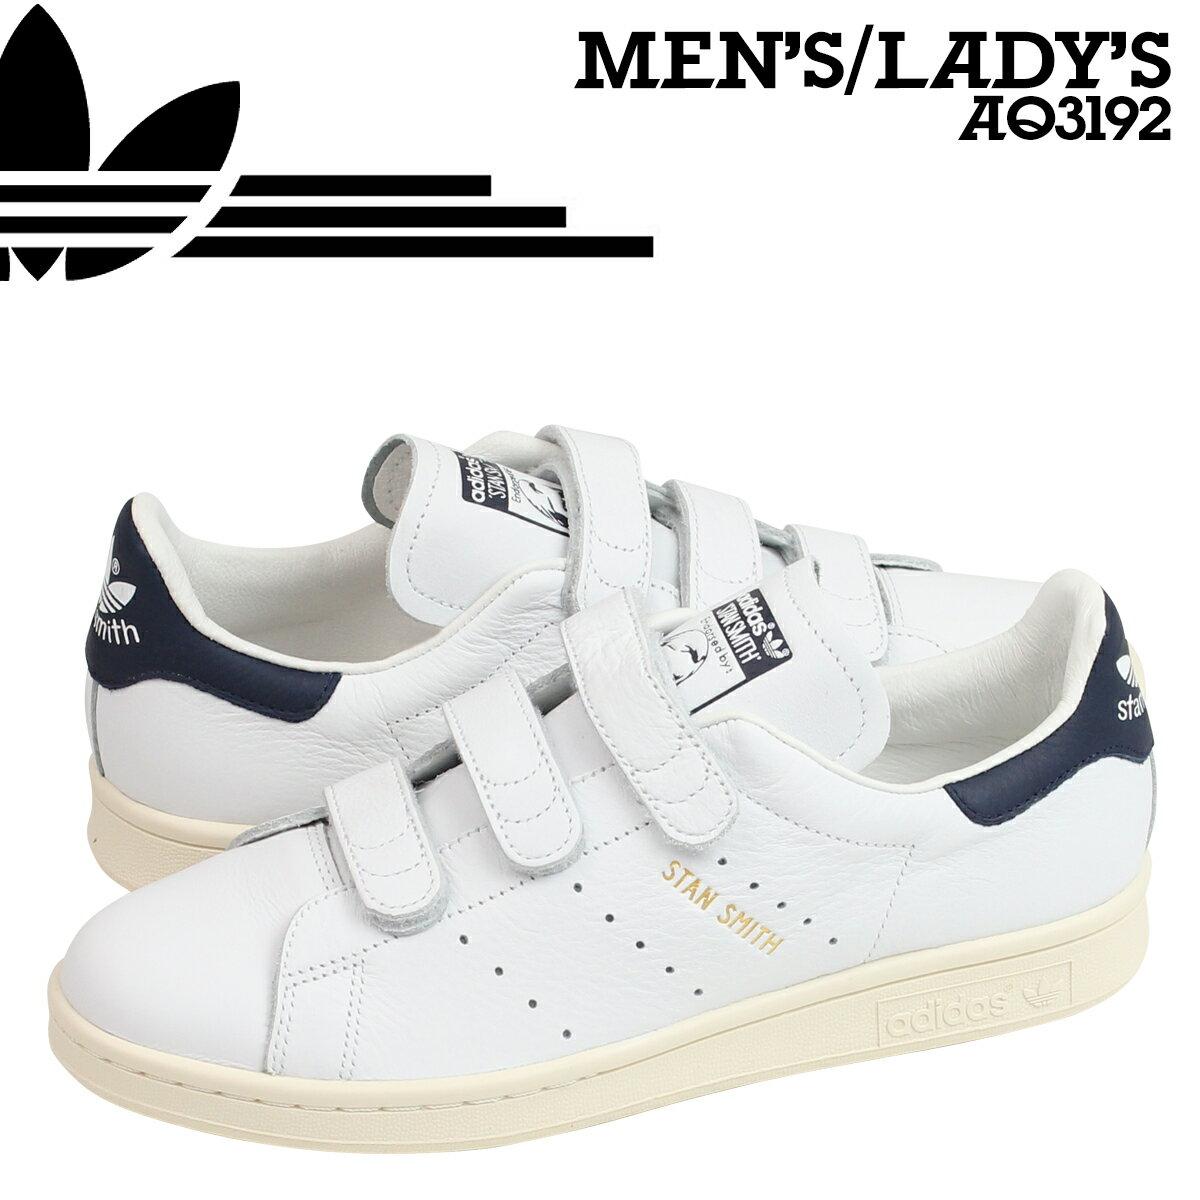 adidas Originals アディダス オリジナルス スタンスミス コンフォート スニーカー STAN SMITH CF AQ3192 メンズ レディース 靴 ホワイト